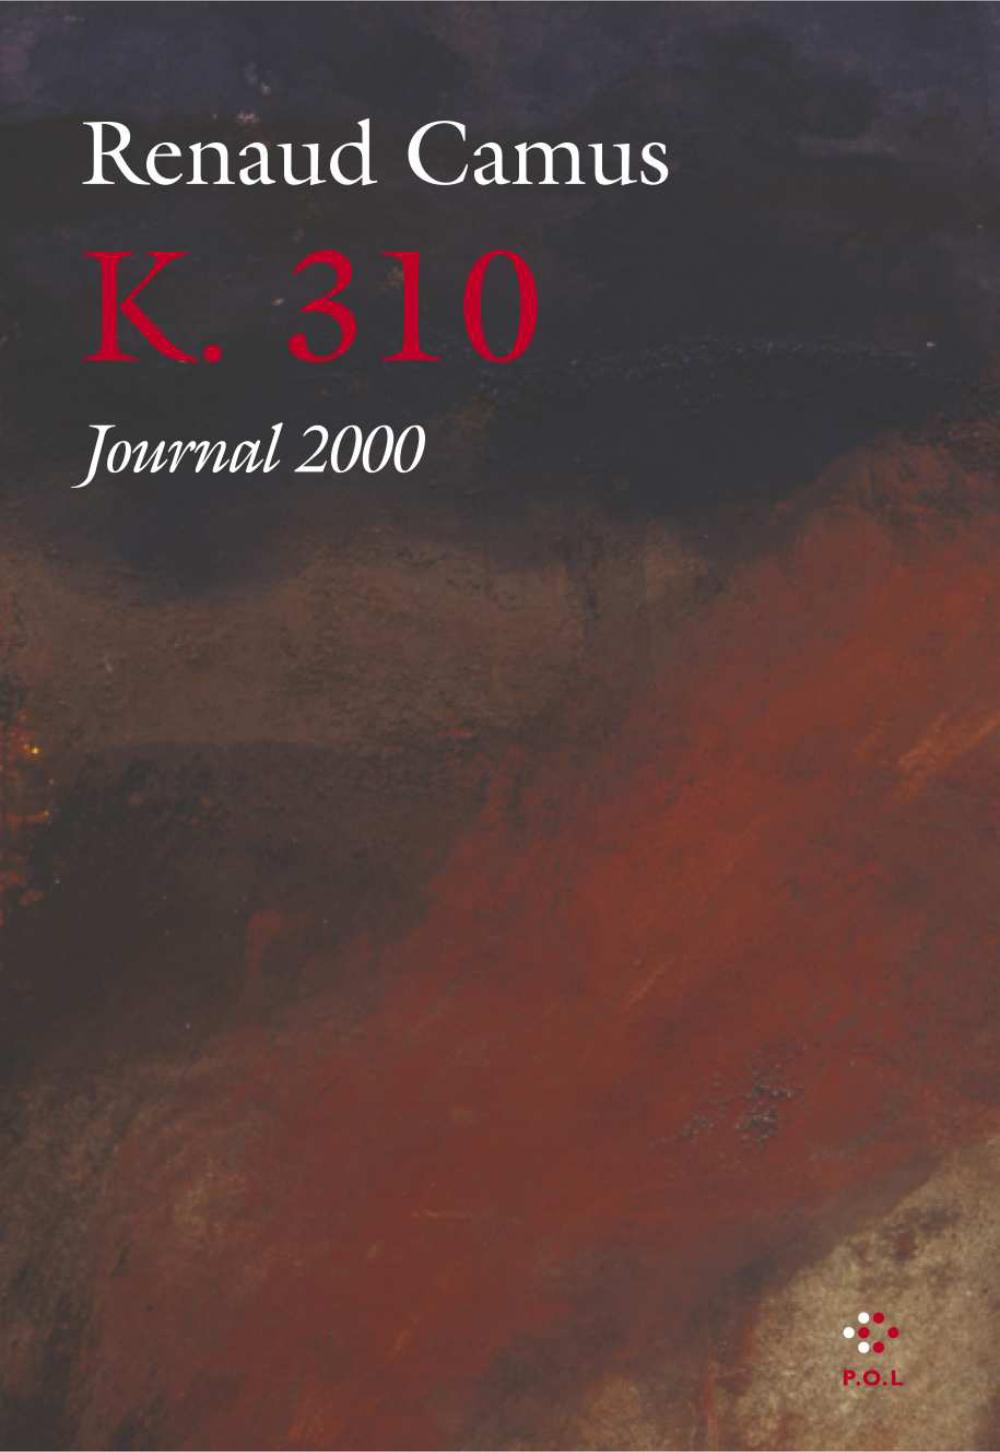 K. 310